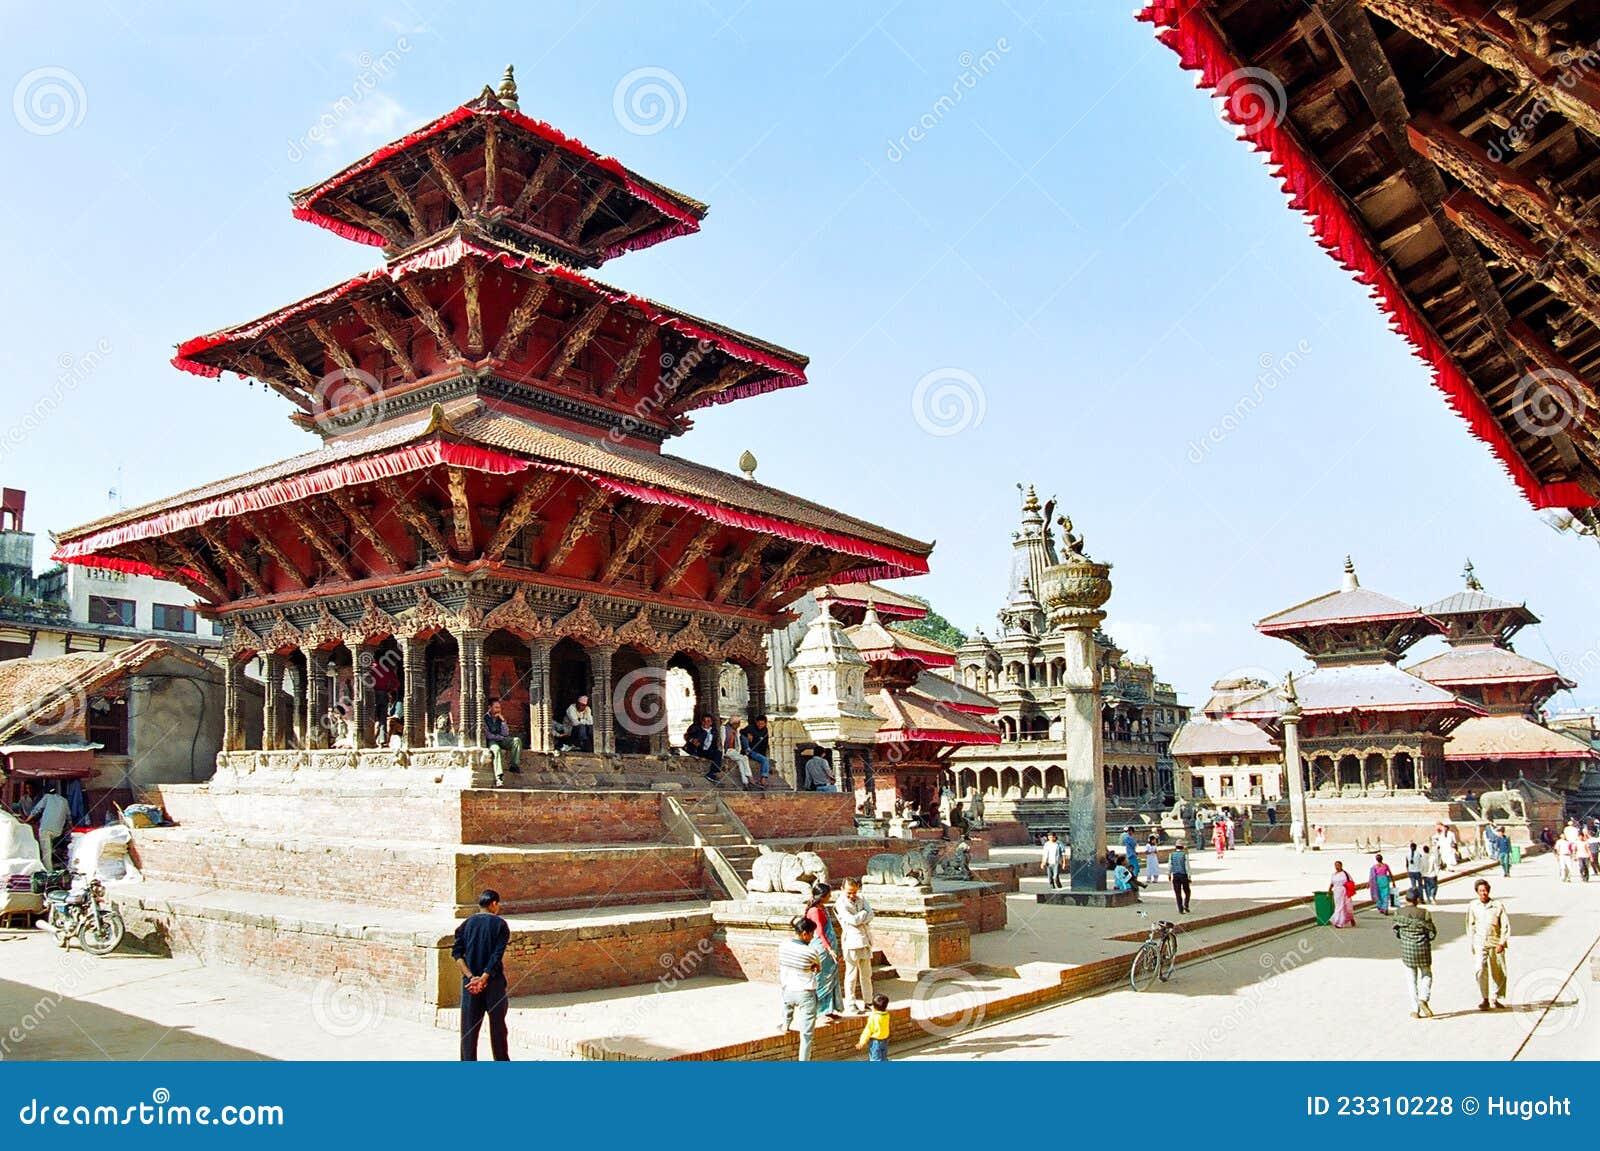 Kathmandu Dating Site Free Online Dating in Kathmandu BA